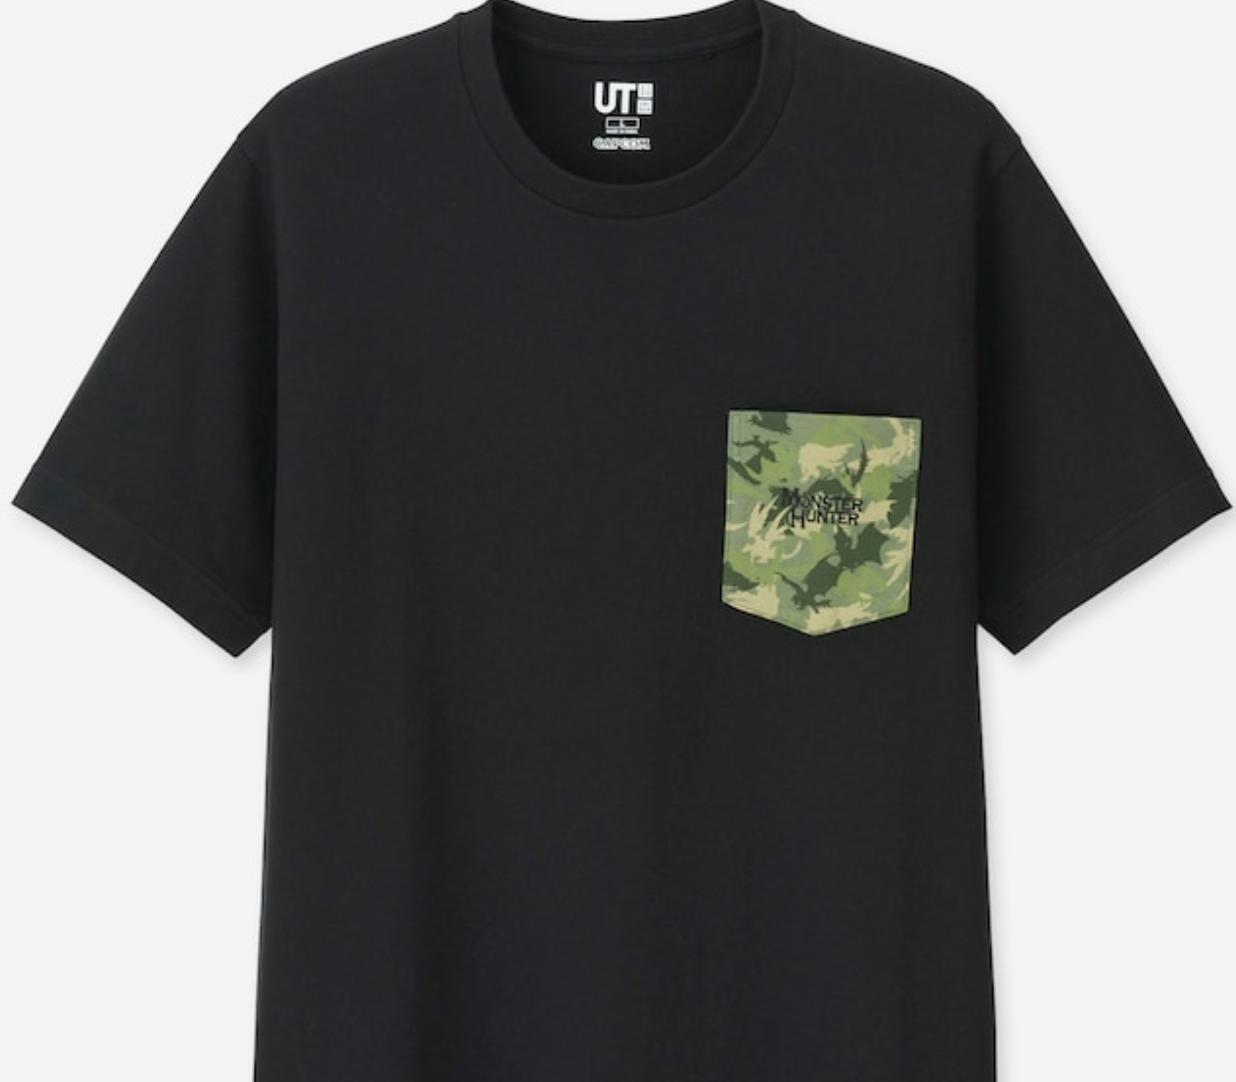 good service where can i buy 100% satisfaction Uniqlo Men's Super Mario Graphic T-Shirts $5.90, Capcom ...